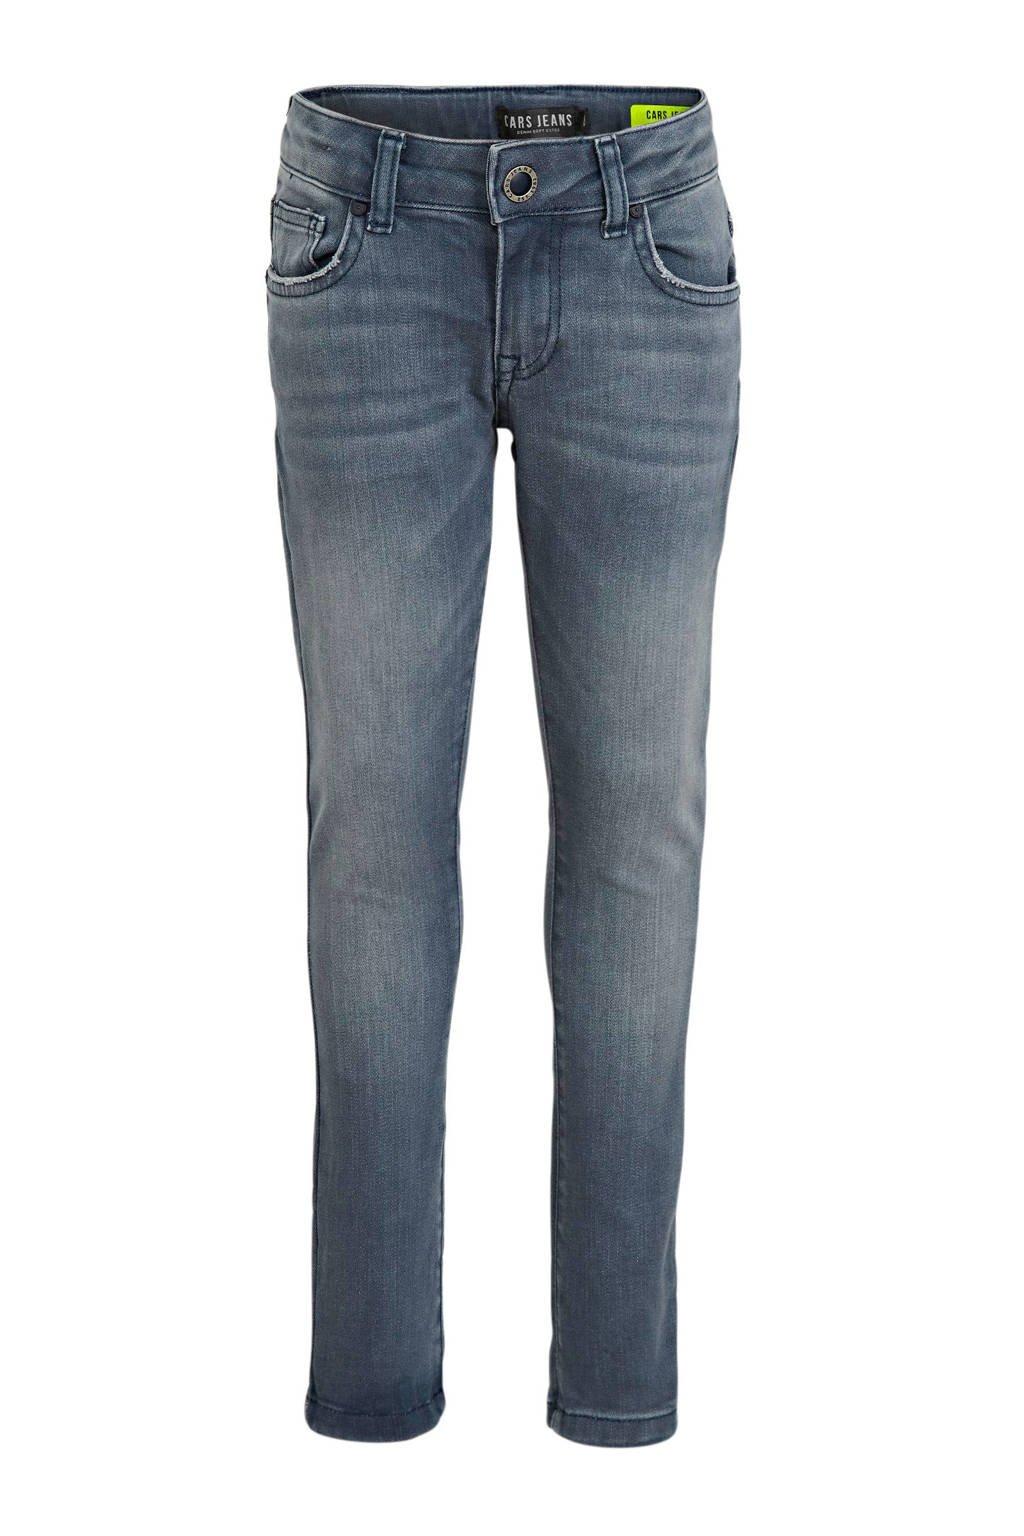 Cars slim fit jeans Rooklyn manhattan wash, Manhattan Wash